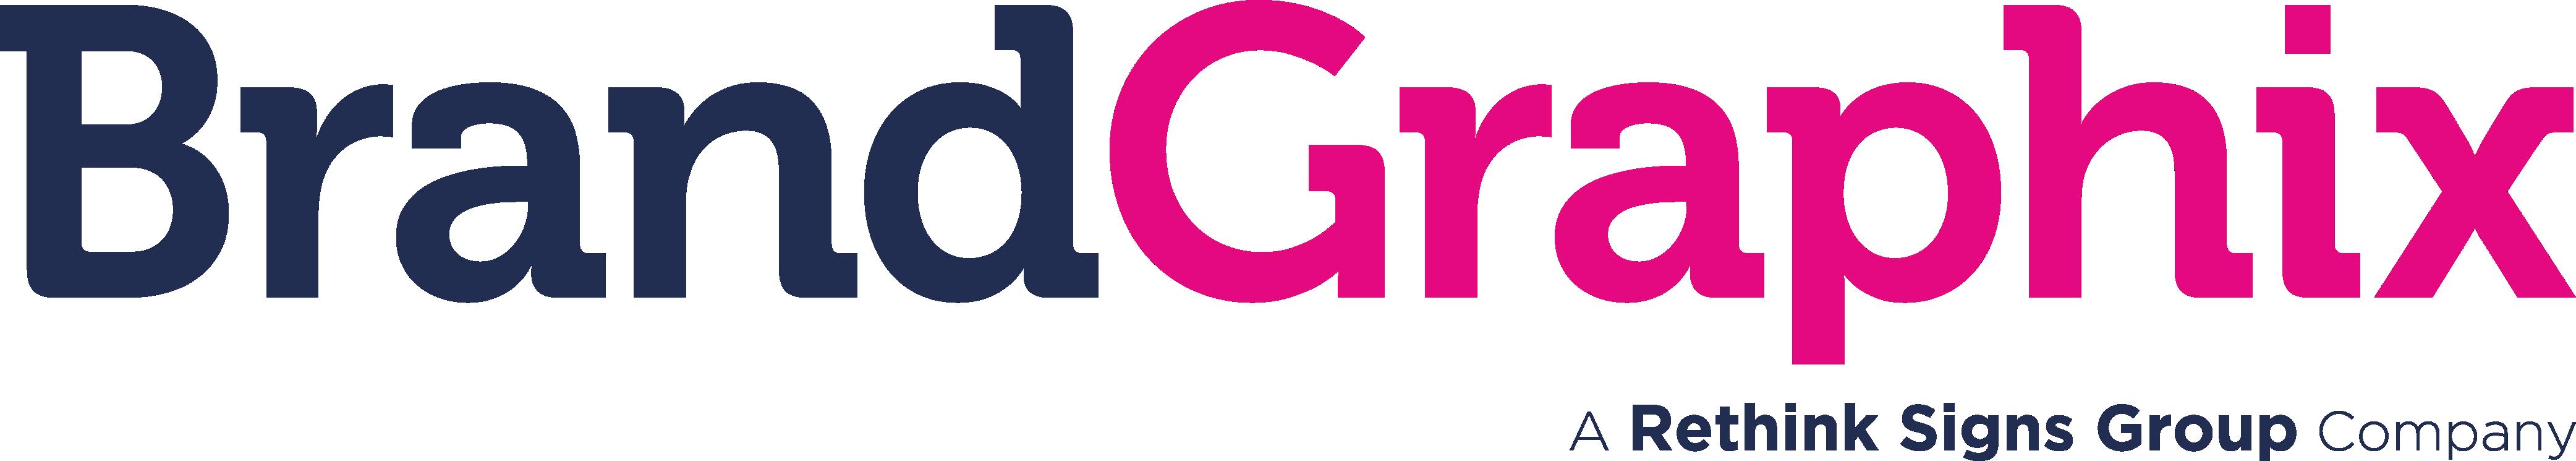 Brand Graphix Logo 3